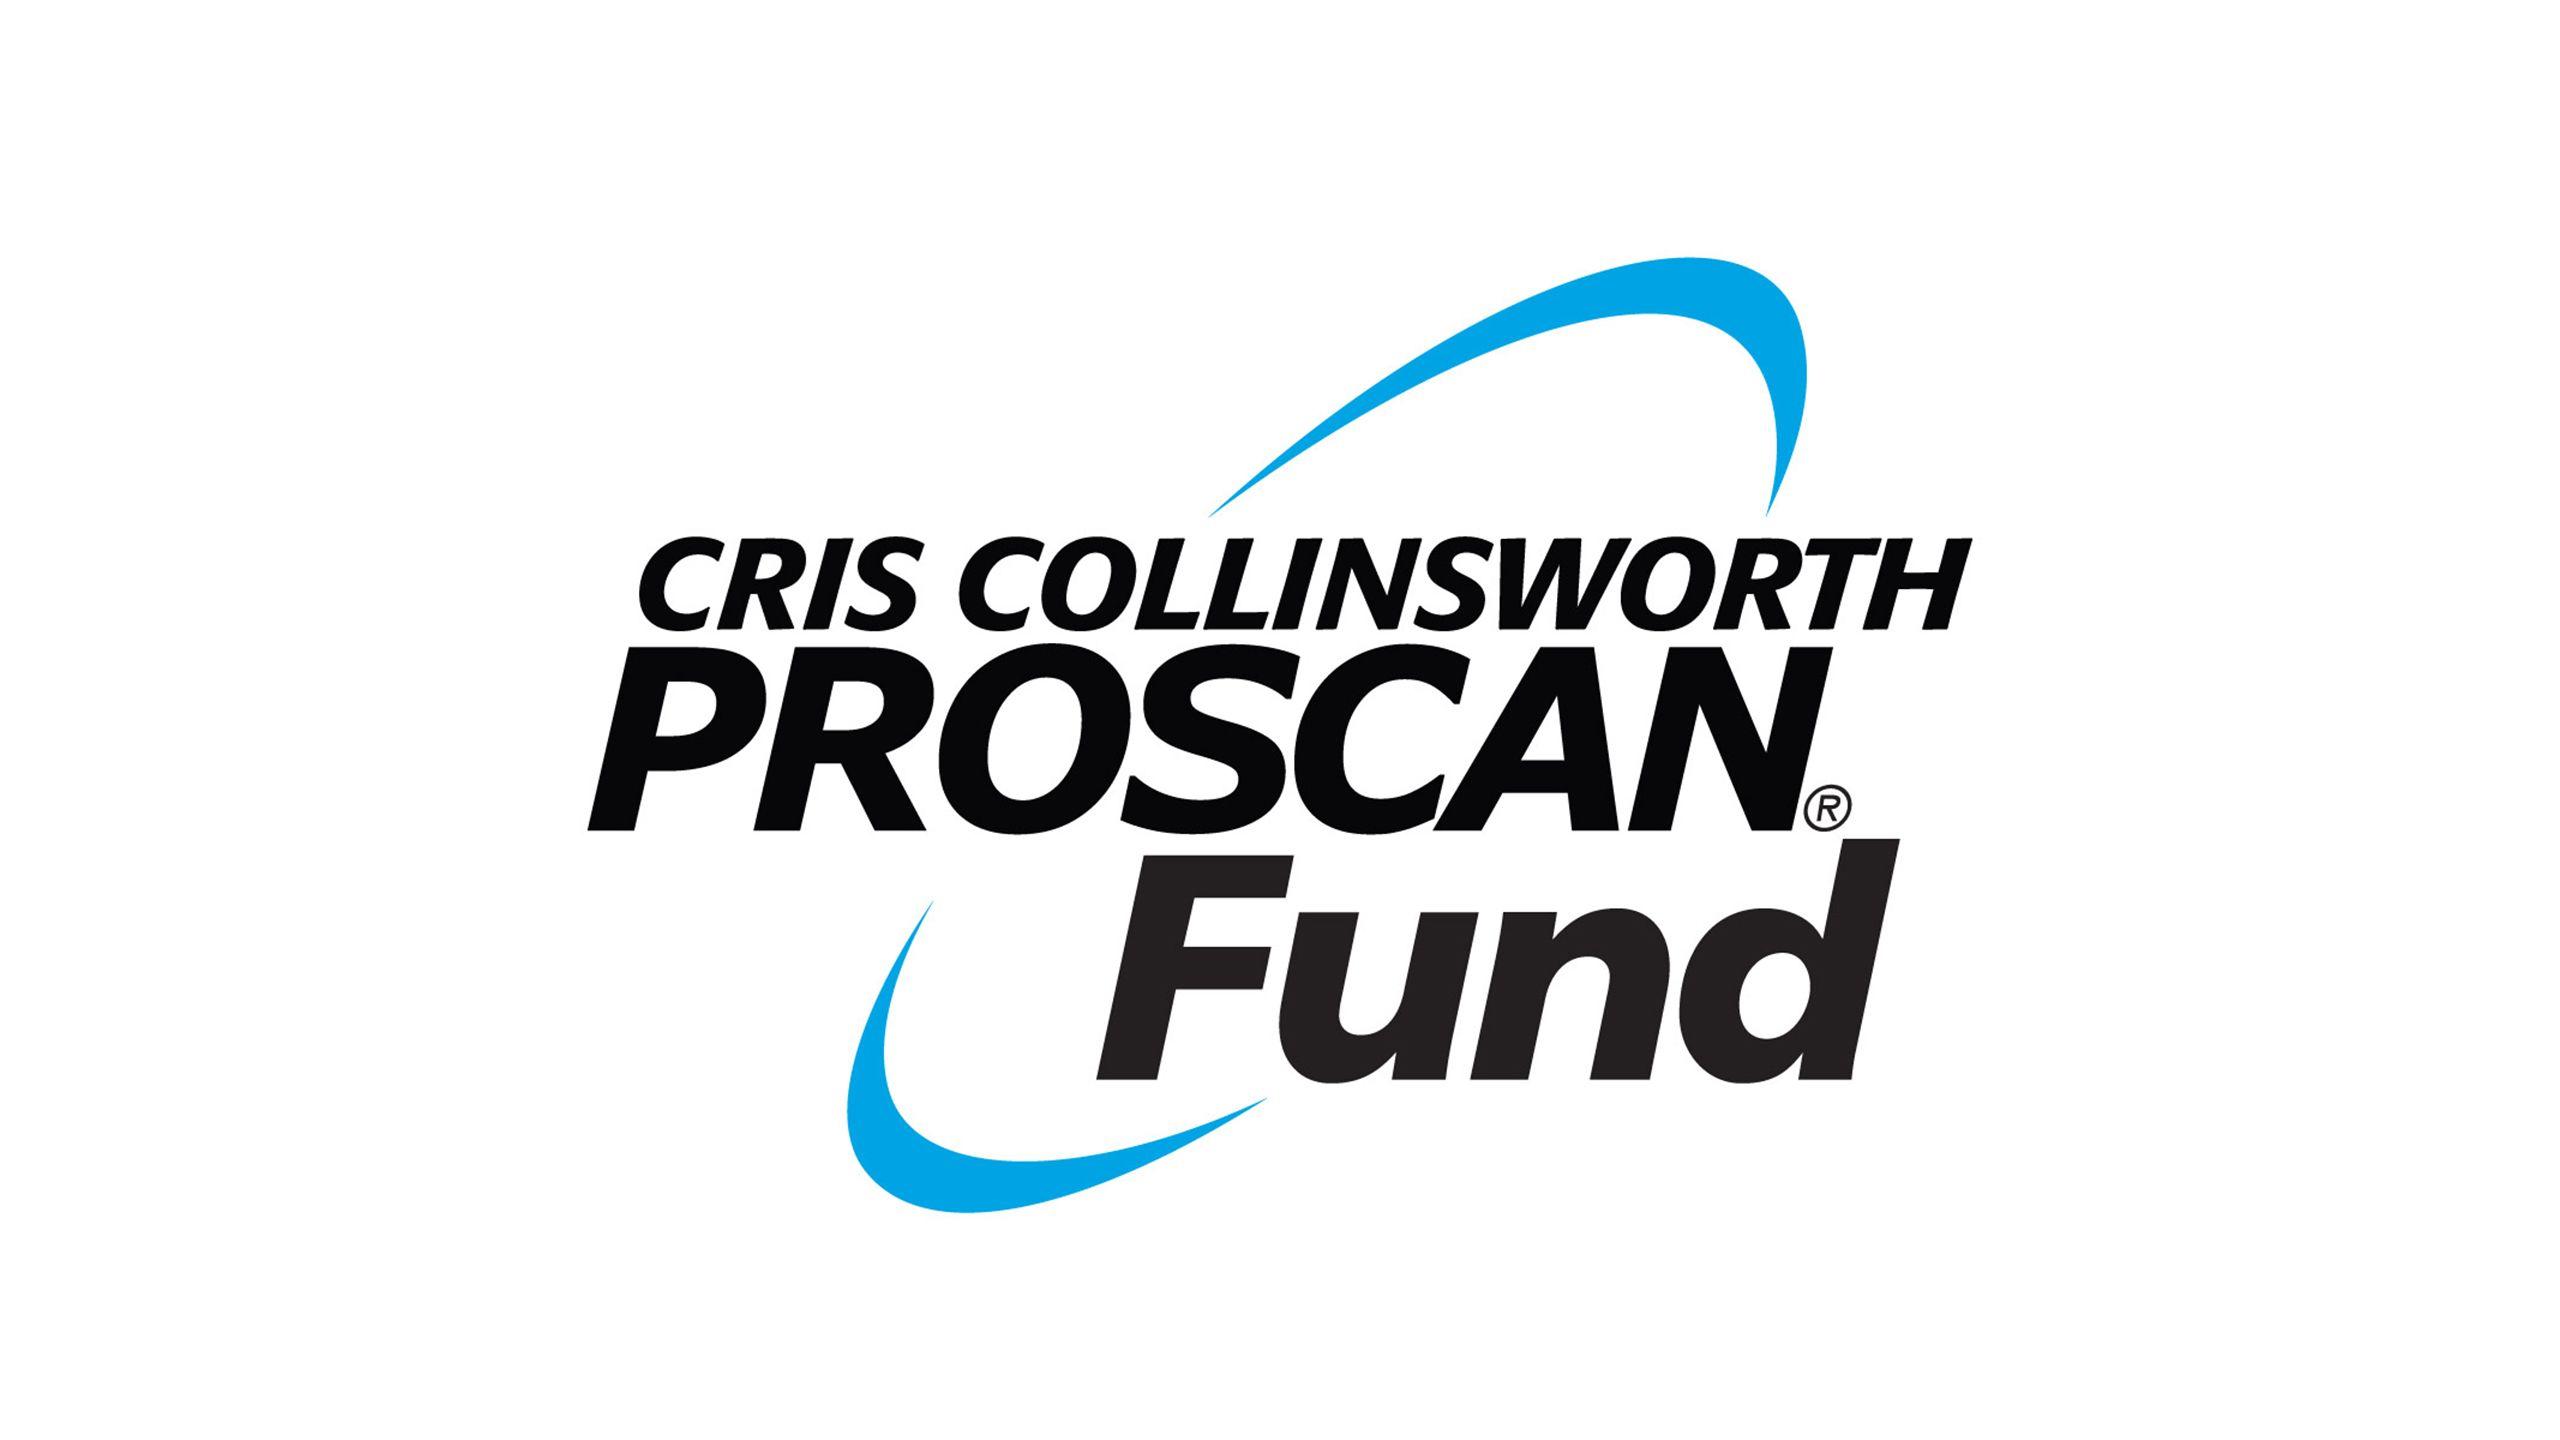 Cris Collinsworth Pro Scan Fund